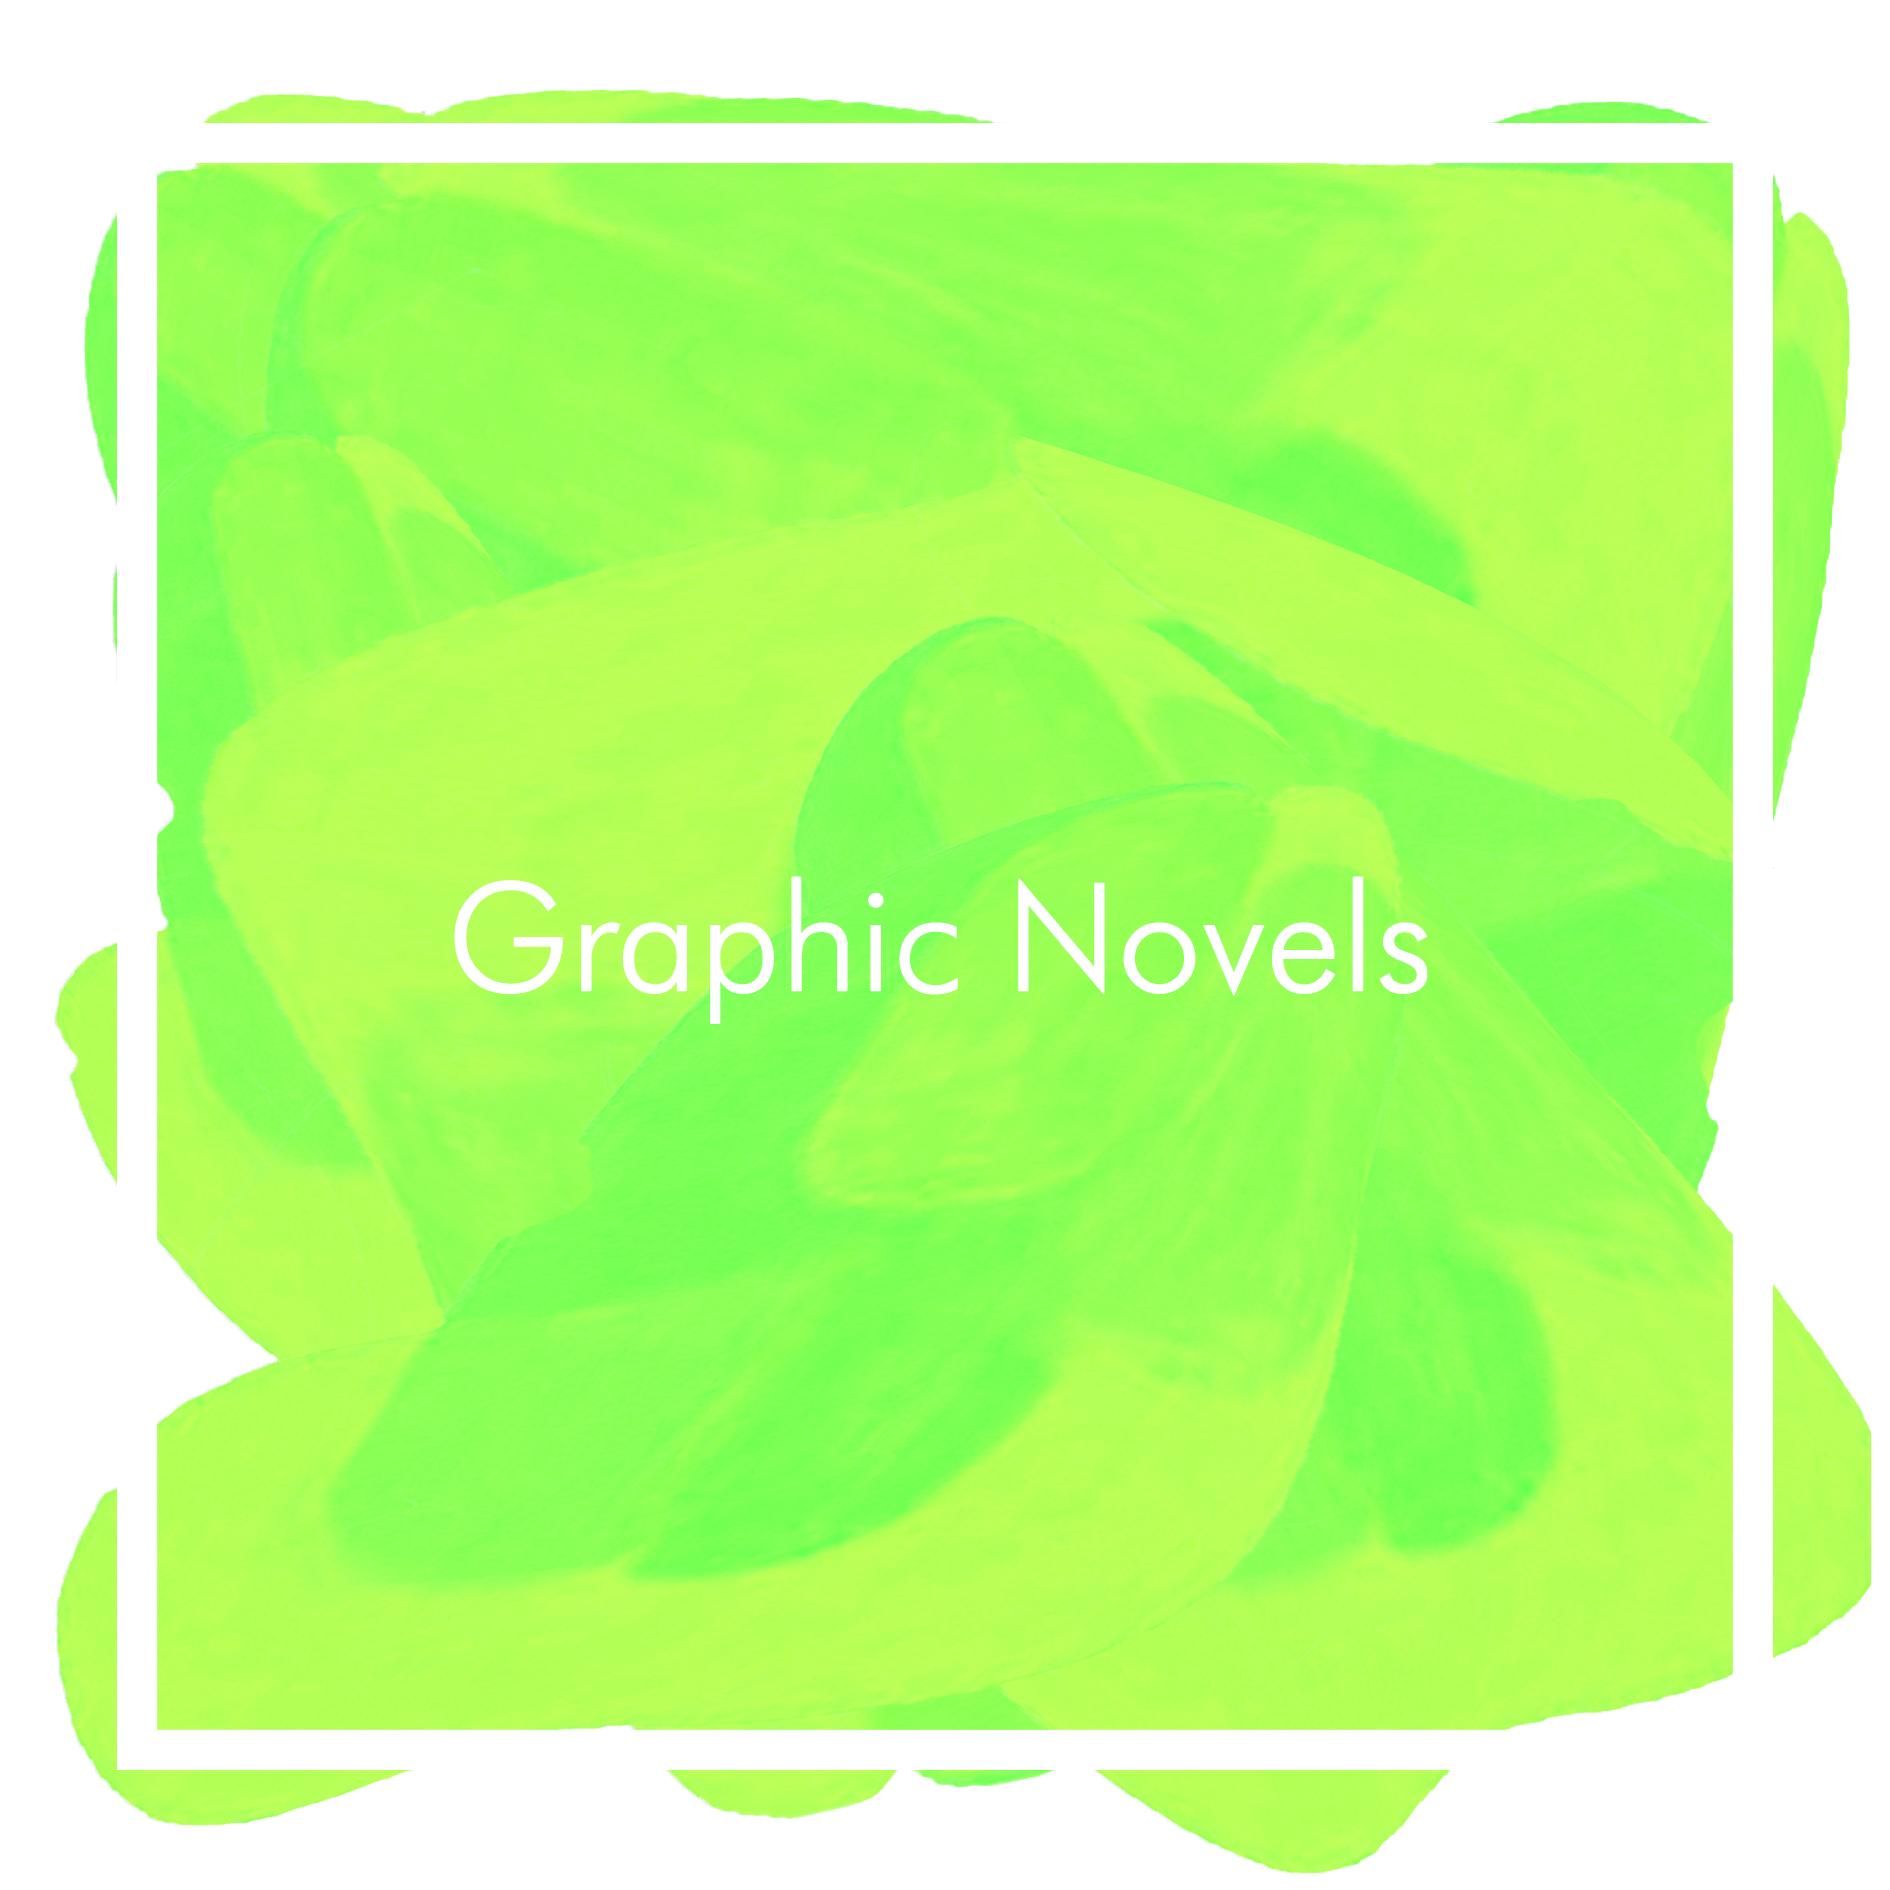 graphic novels.jpg